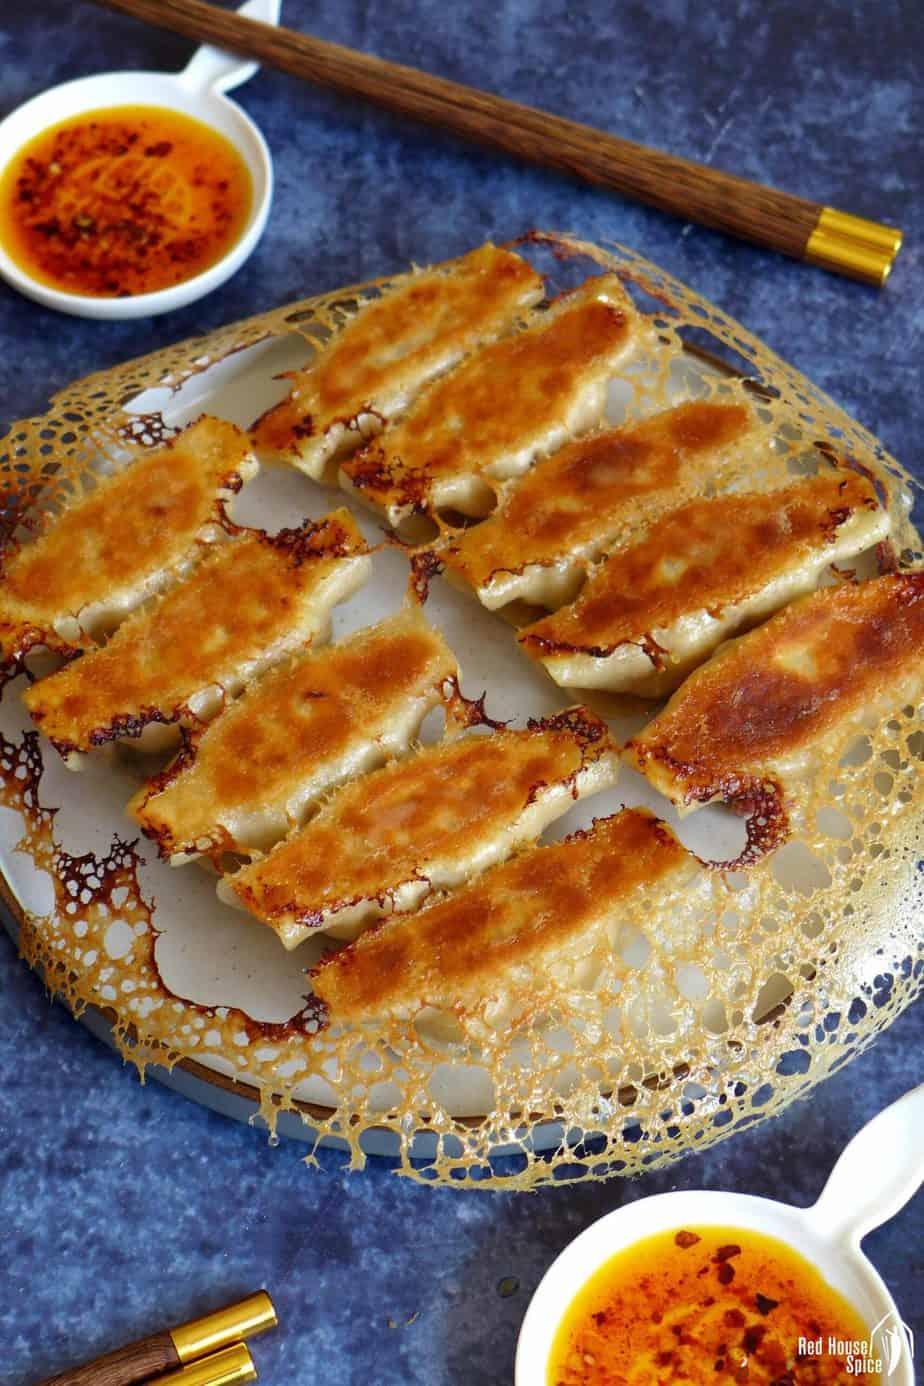 Pan-fried chicken potstickers